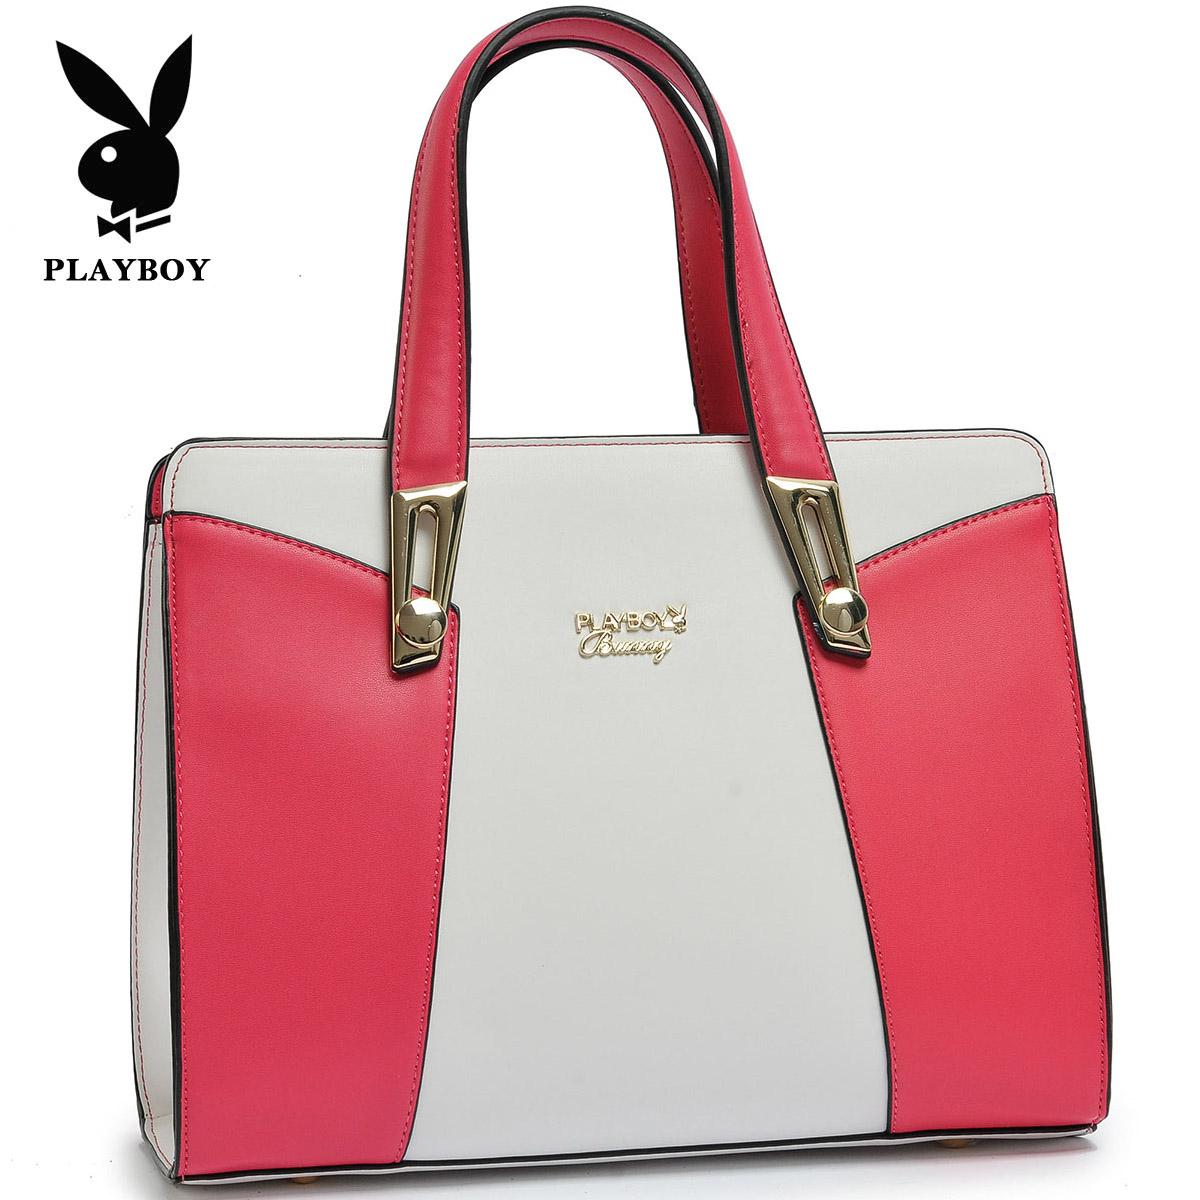 Сумка Playboy pbk2331/4b сумка playboy pca5771 4b 2015